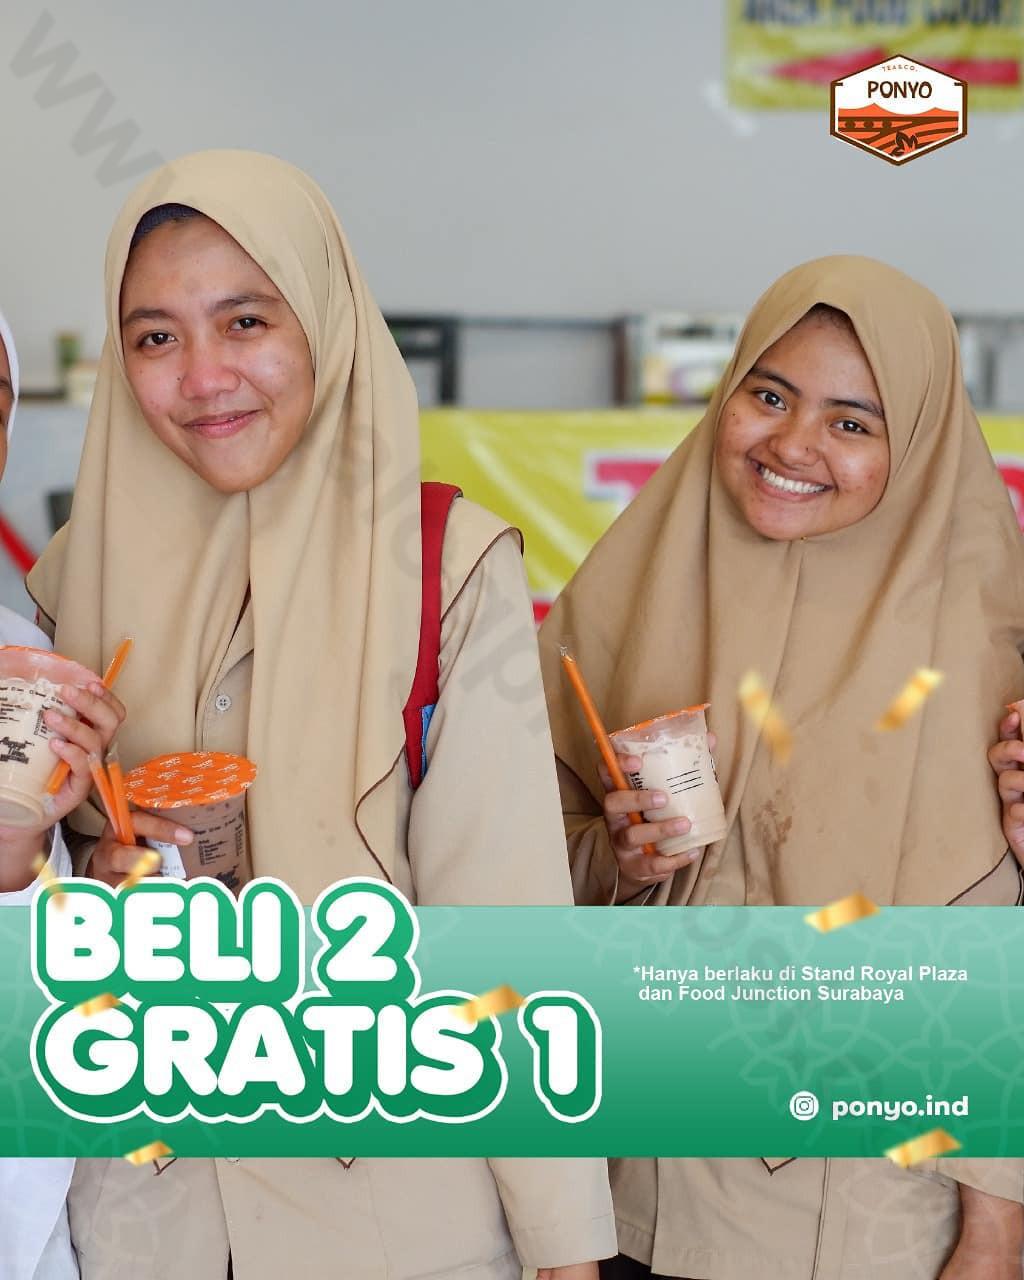 <div>PONYO Royal Plaza & Food Junction Surabaya Promo BELI 2 GRATIS 1*</div>